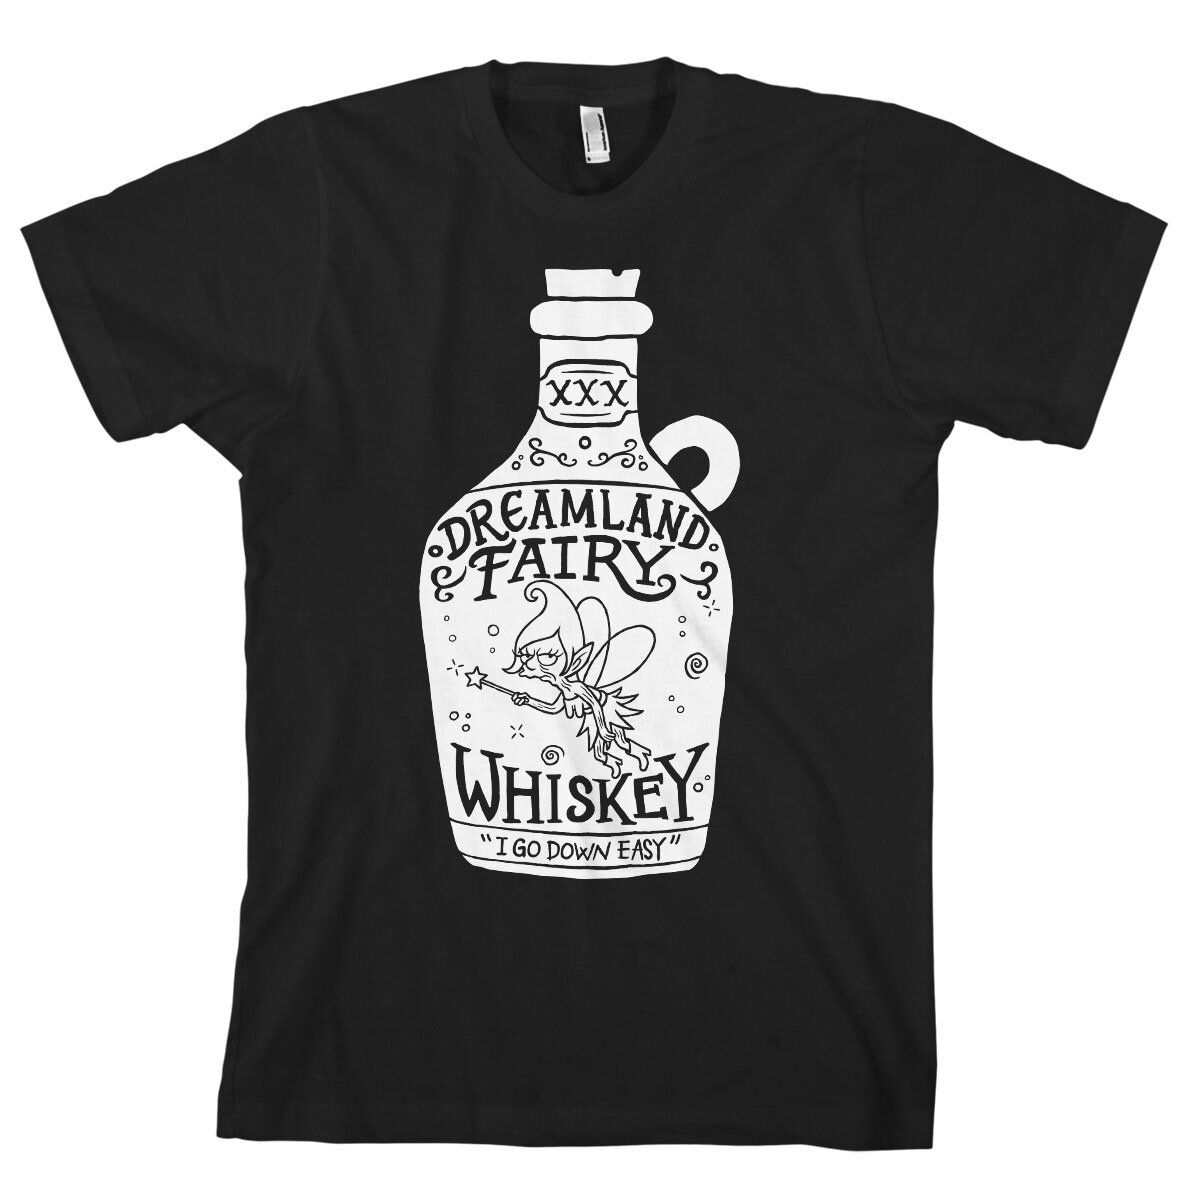 Dreamland Fairy Whiskey T-Shirt